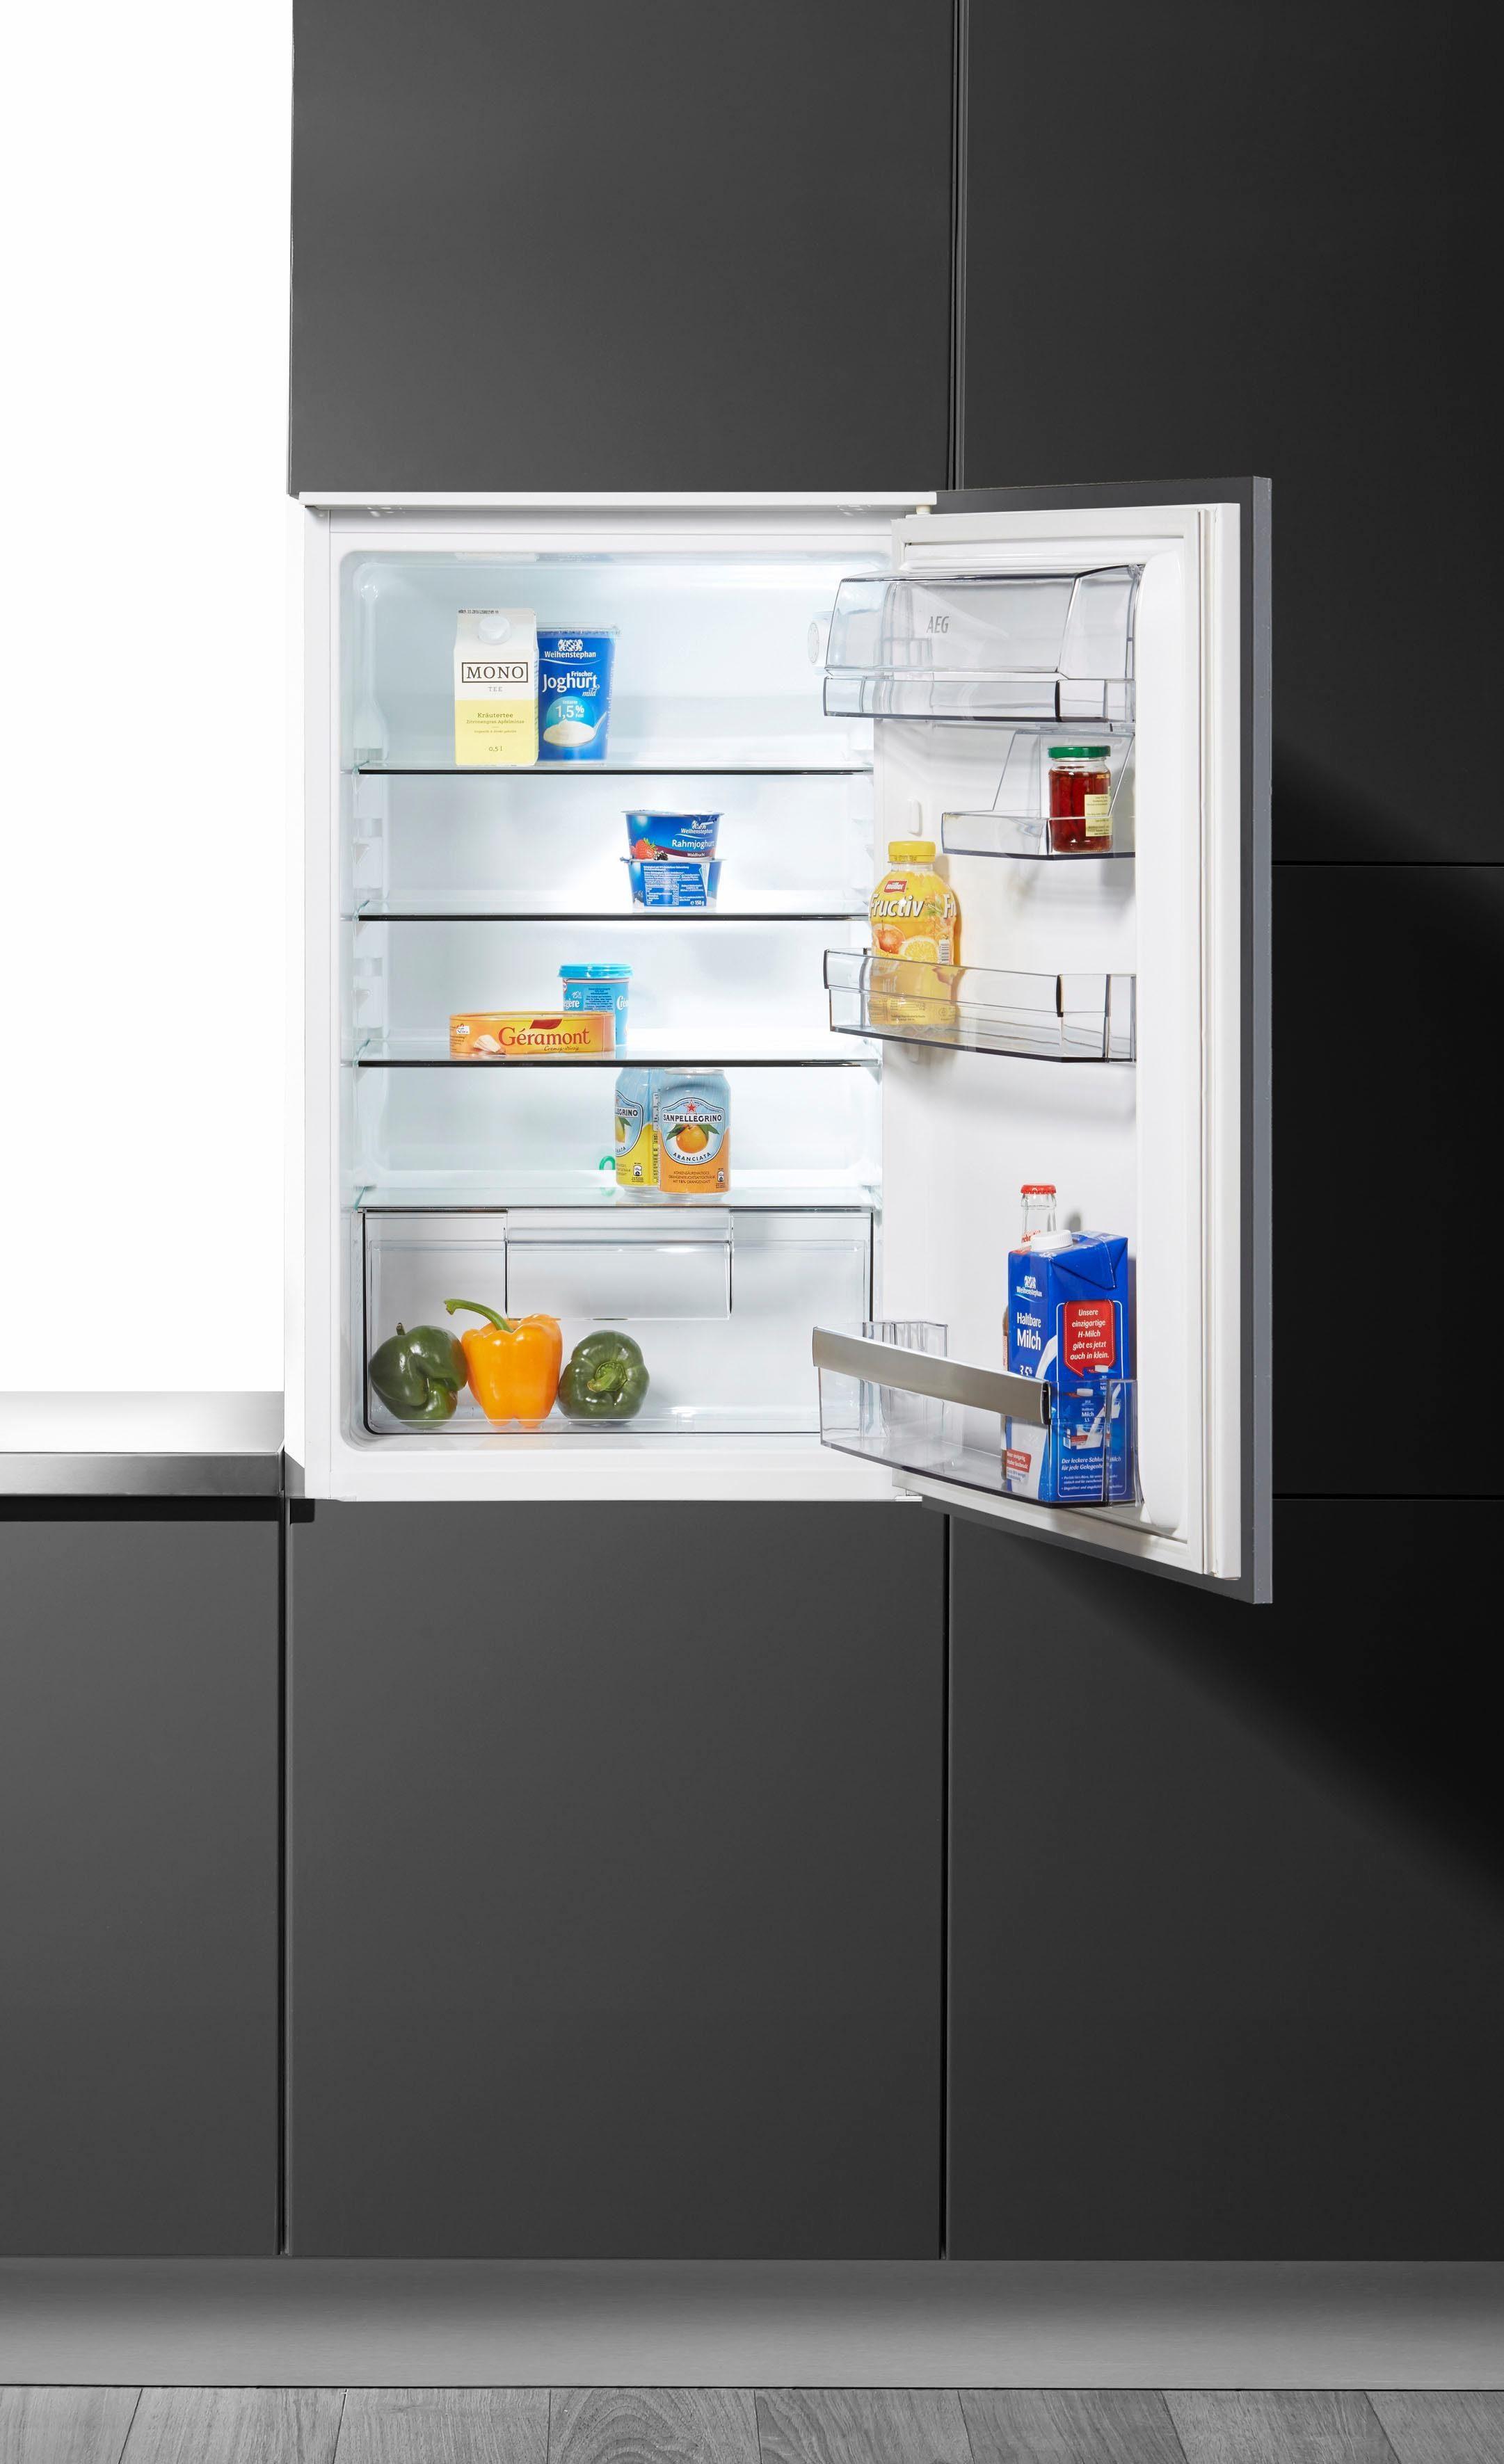 AEG Einbaukühlschrank Santo SKB58821AS, 87,3 cm hoch, 54,0 cm breit, Energieklasse A++, 87,3 cm hoch, integrierbar